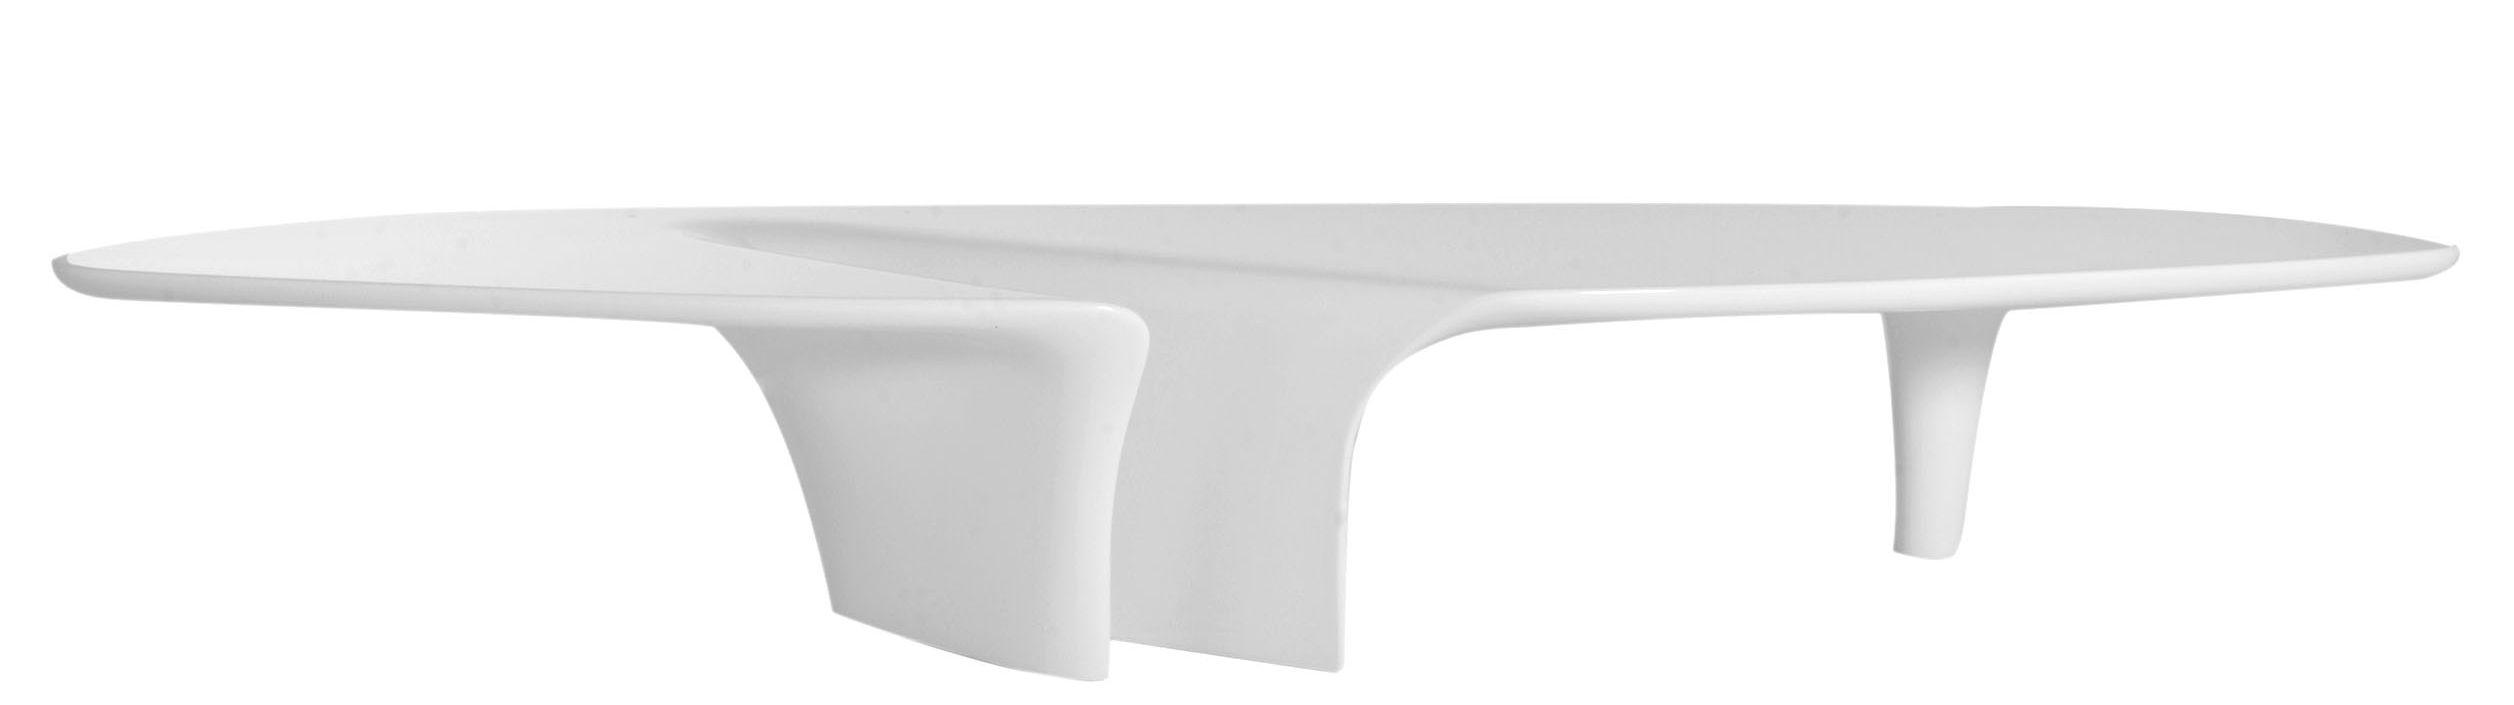 Mobilier - Tables basses - Table basse Waterfall / 216 x 60 cm - Driade - Blanc - Polyuréthane